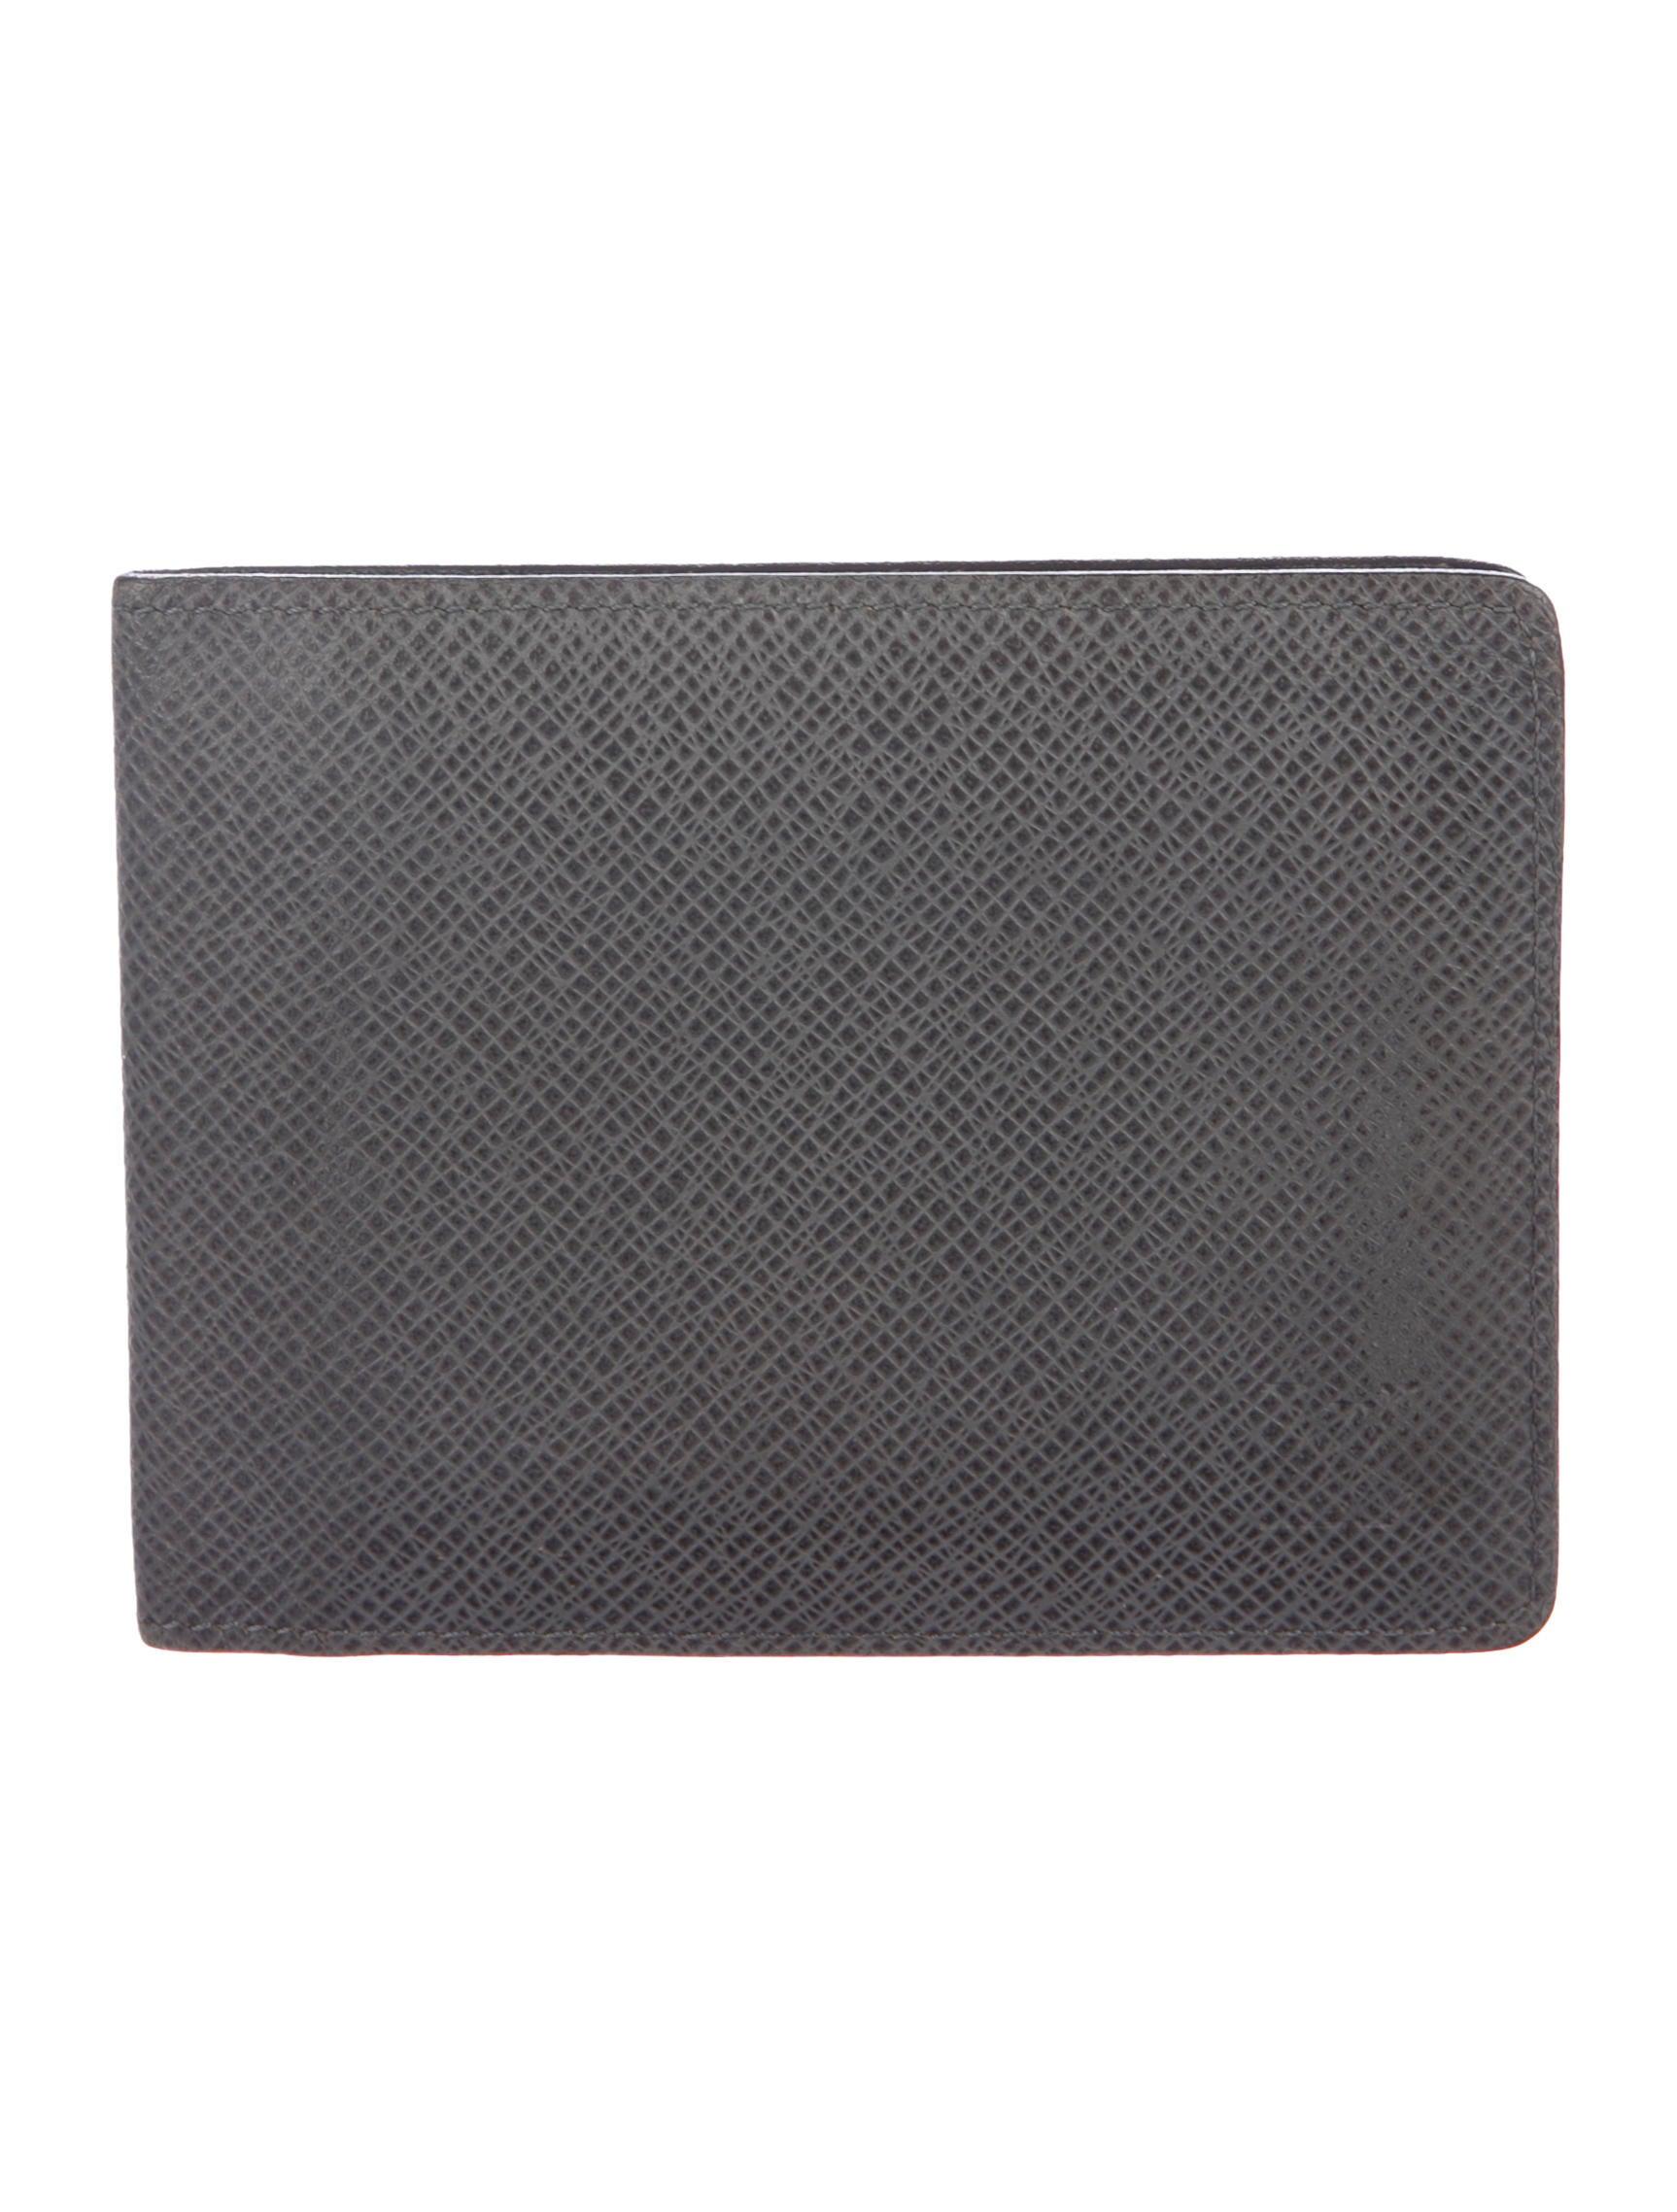 81591666bd8 Louis Vuitton Taïga Bifold Wallet - Accessories - LOU221219